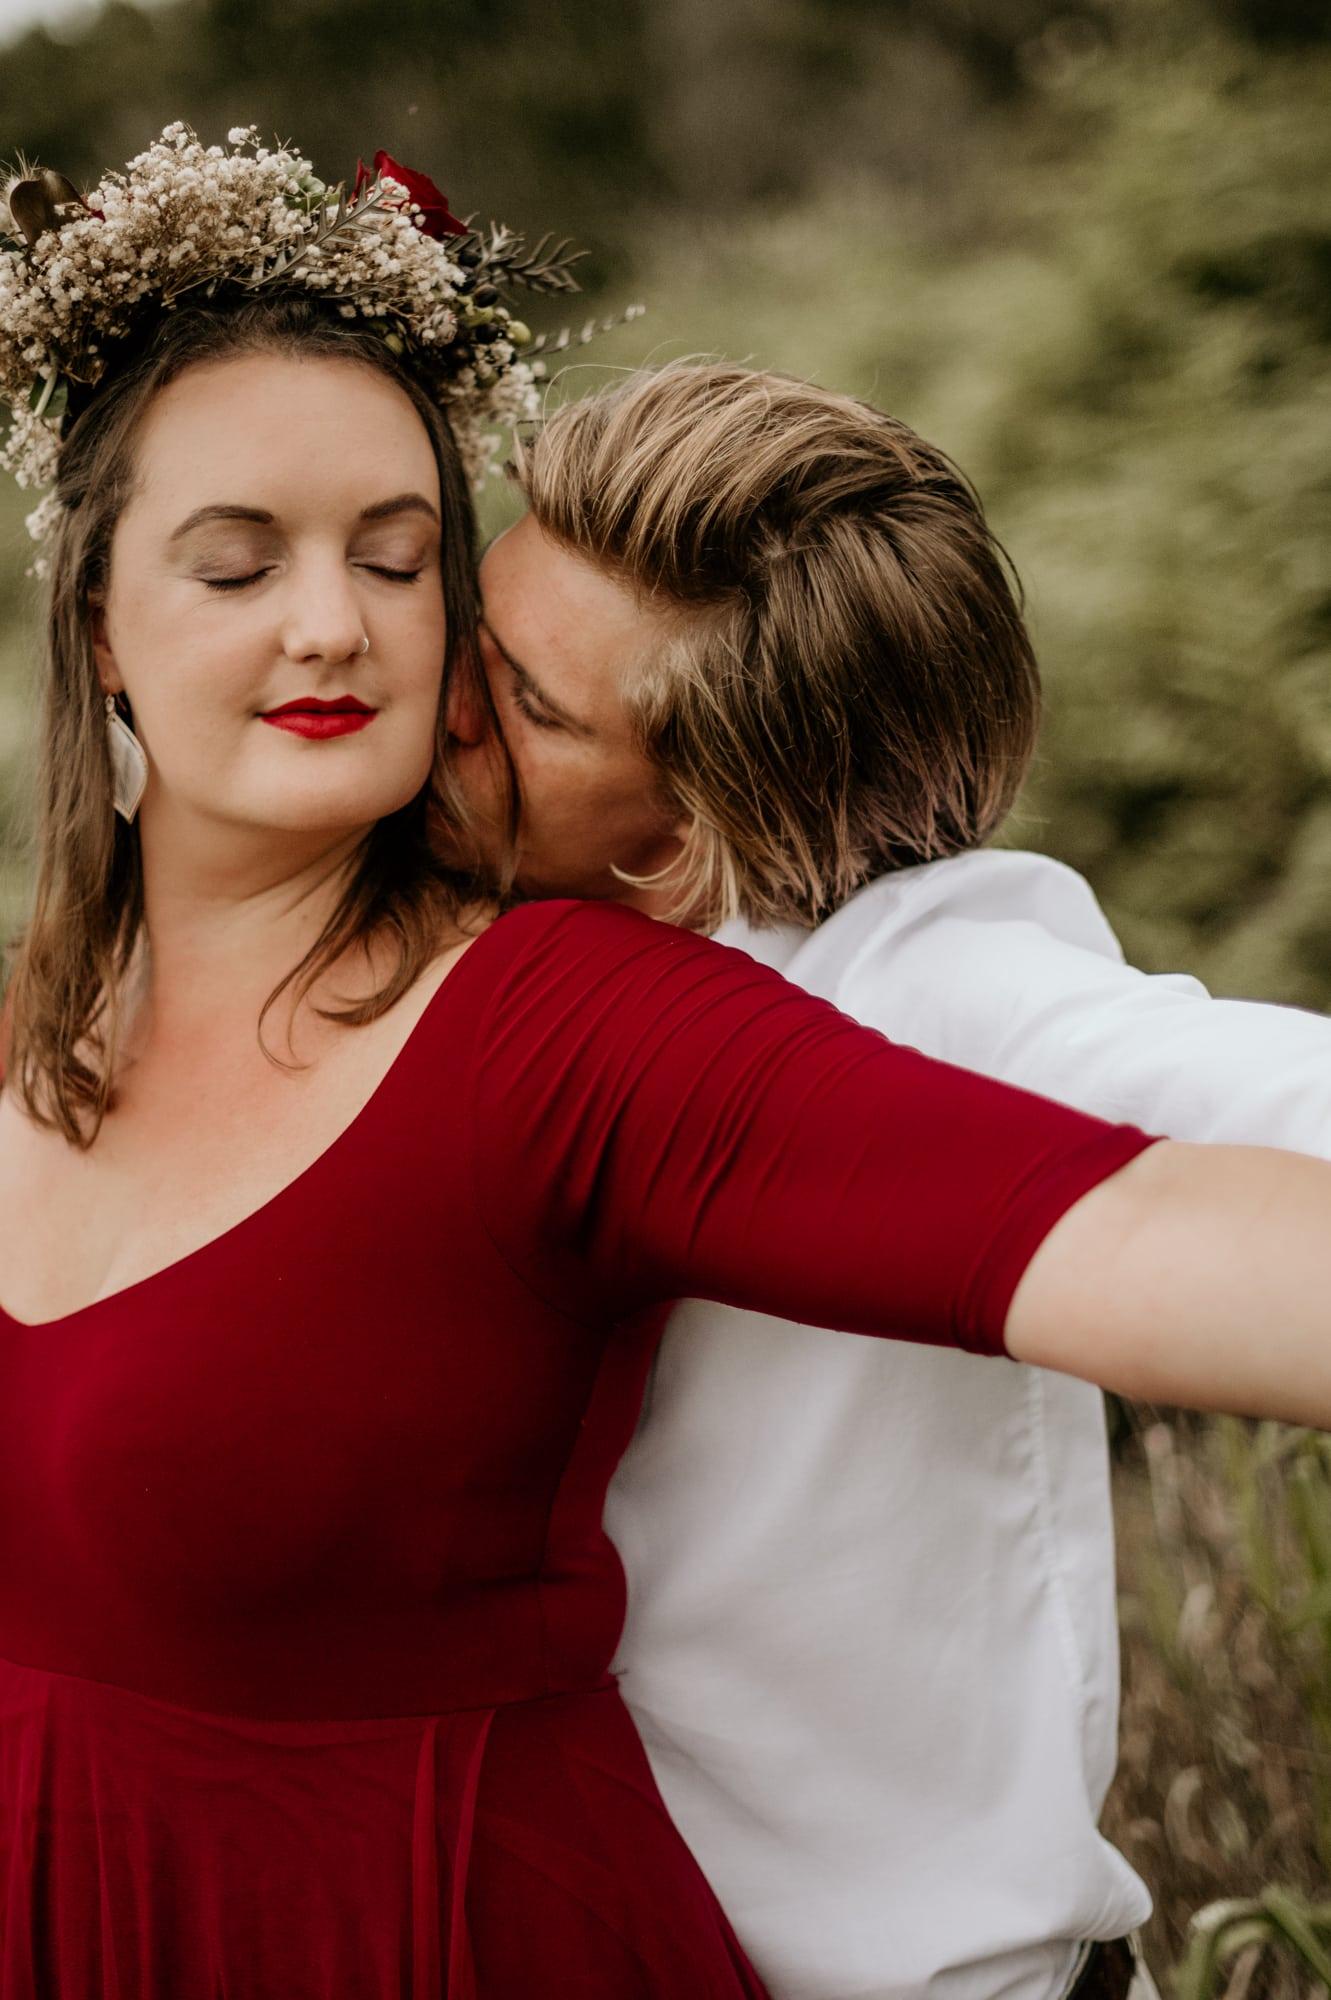 wesley-lanie-george-fernridge-engagement-June-Richards-Photography-Destination-Weddings-Elopements-Garden-Route-04